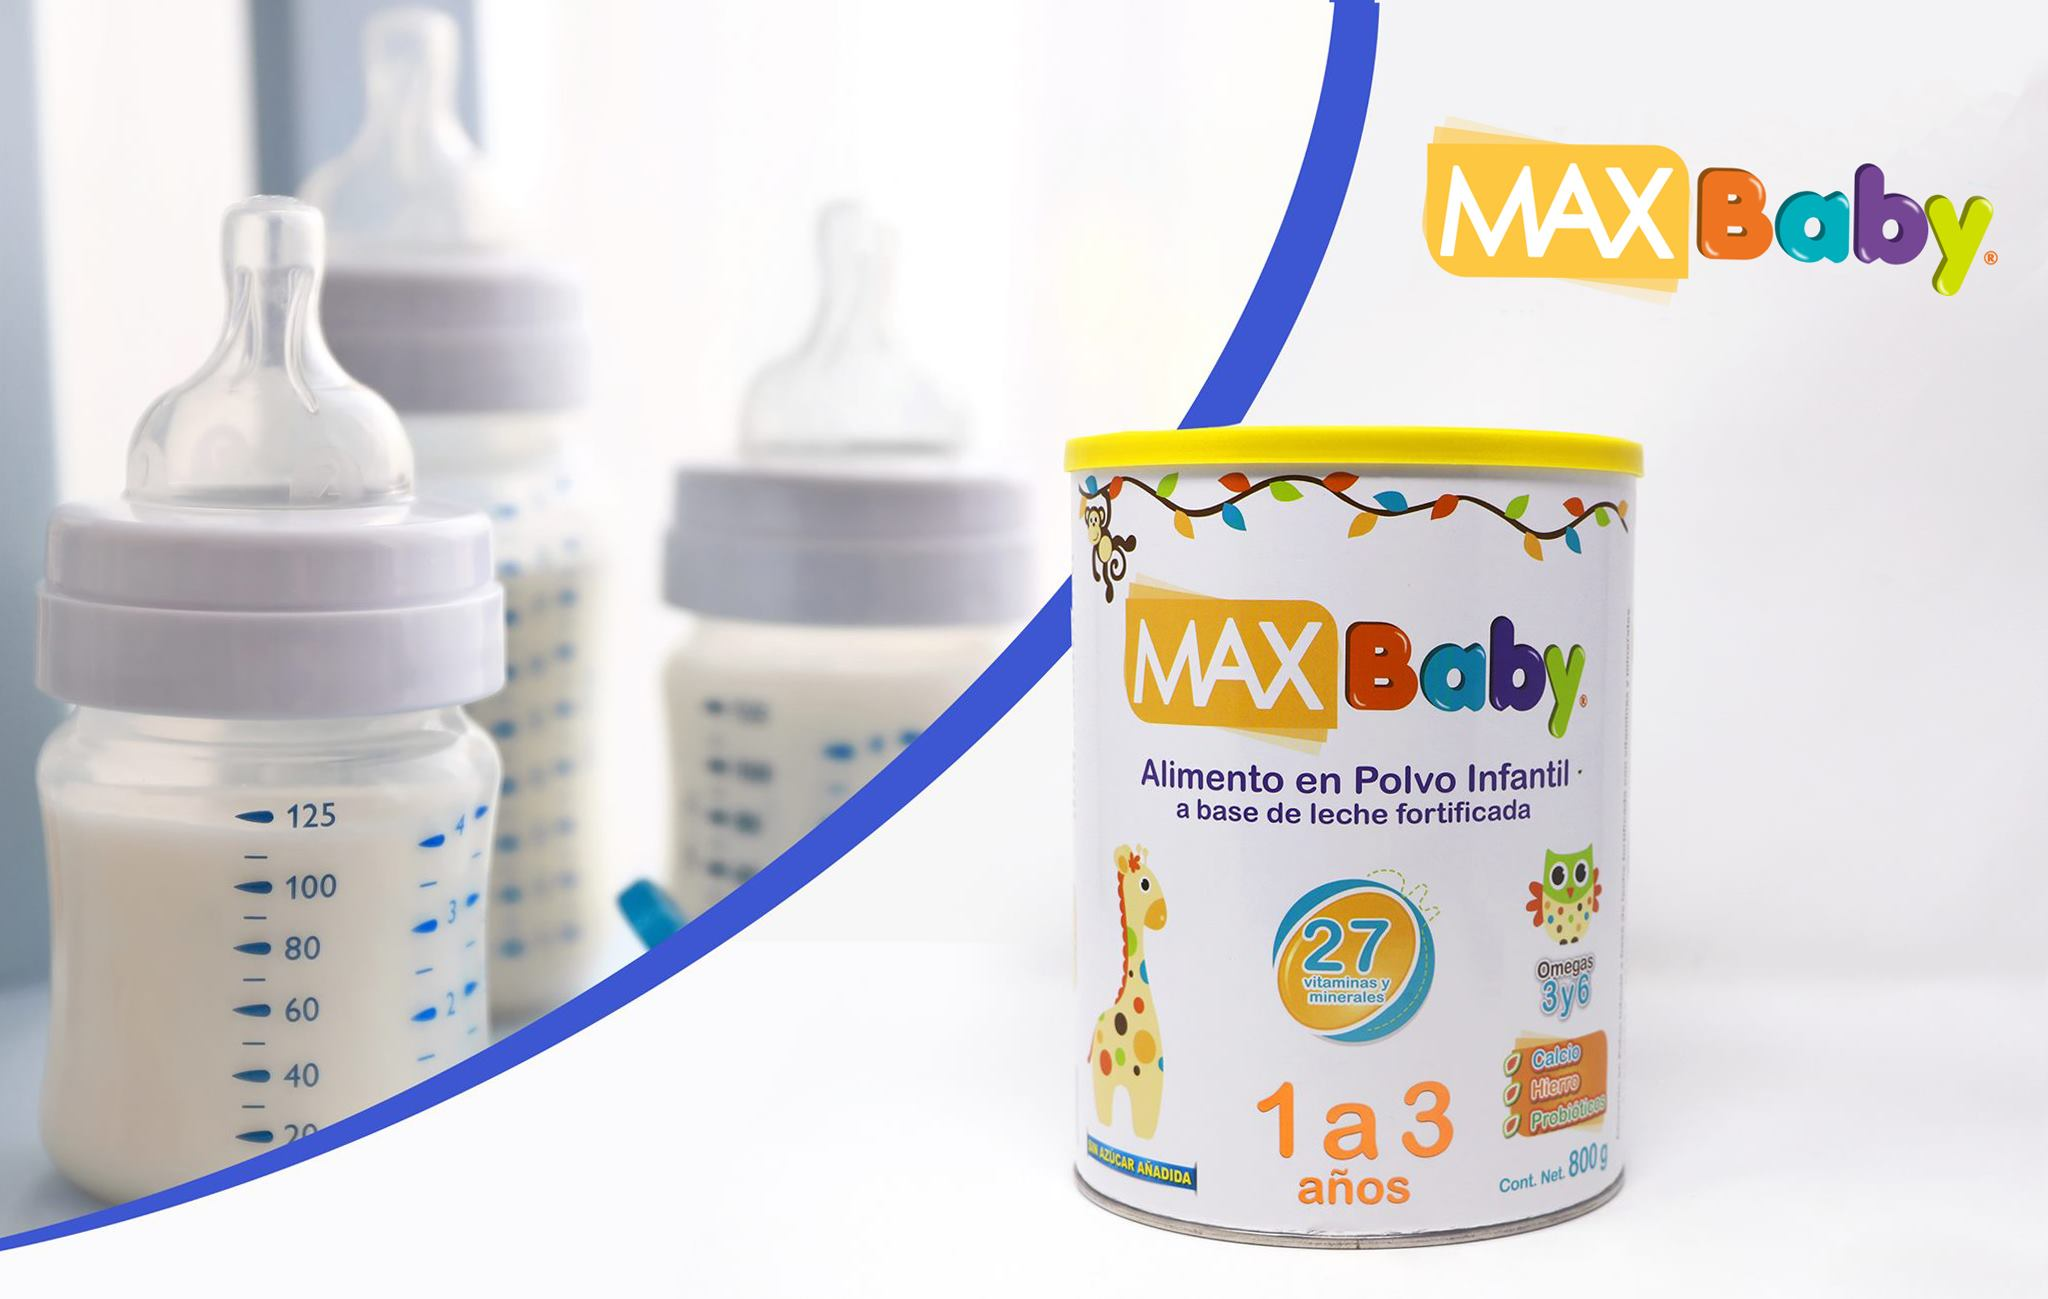 Max Baby